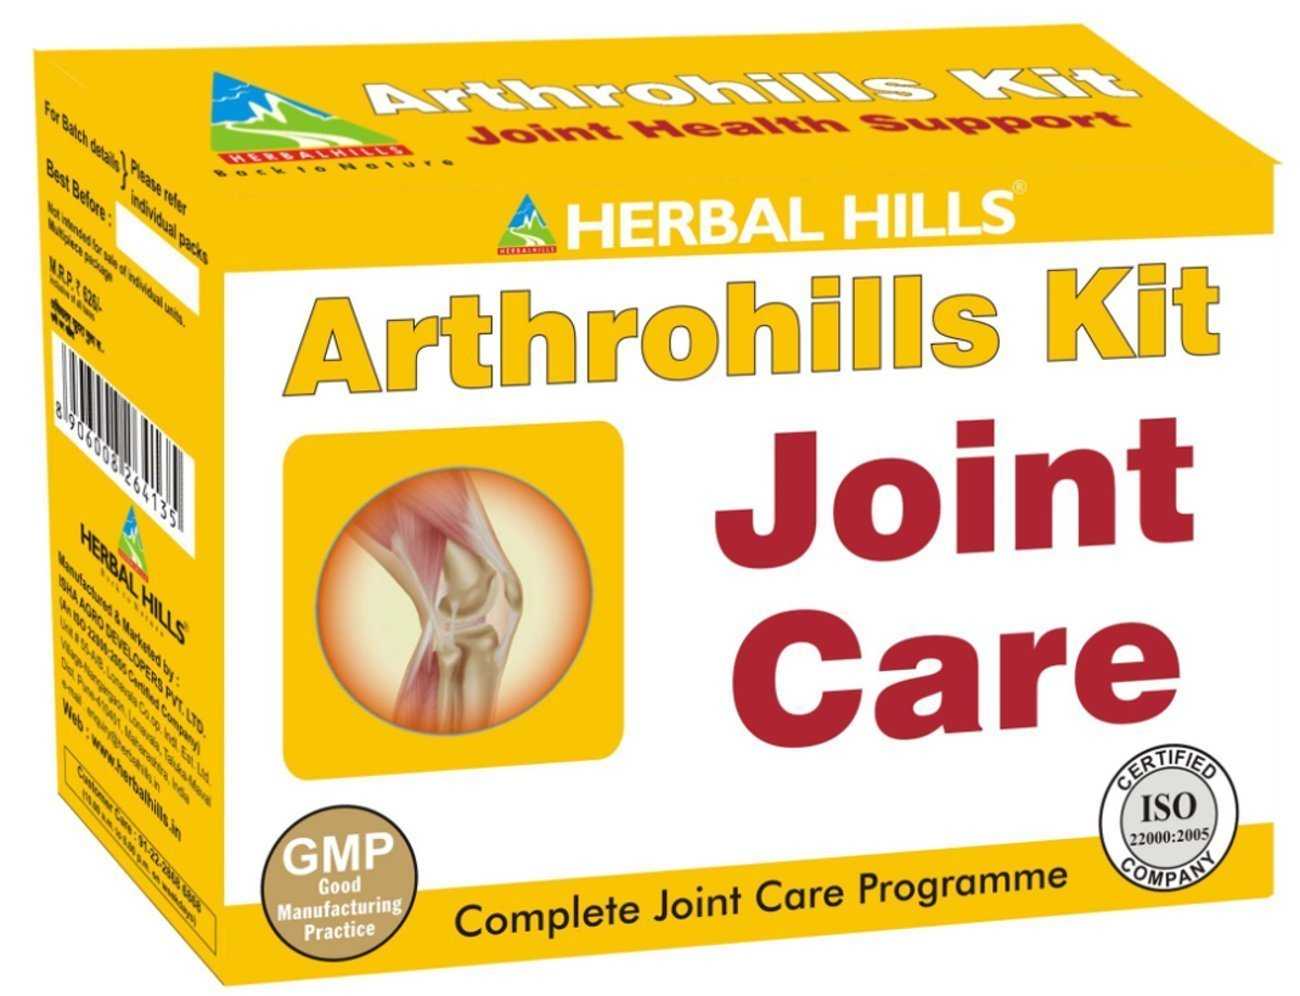 Herbal Hills Arthrohills Ayurvedic Joint Care Kit -Each 500 Mg